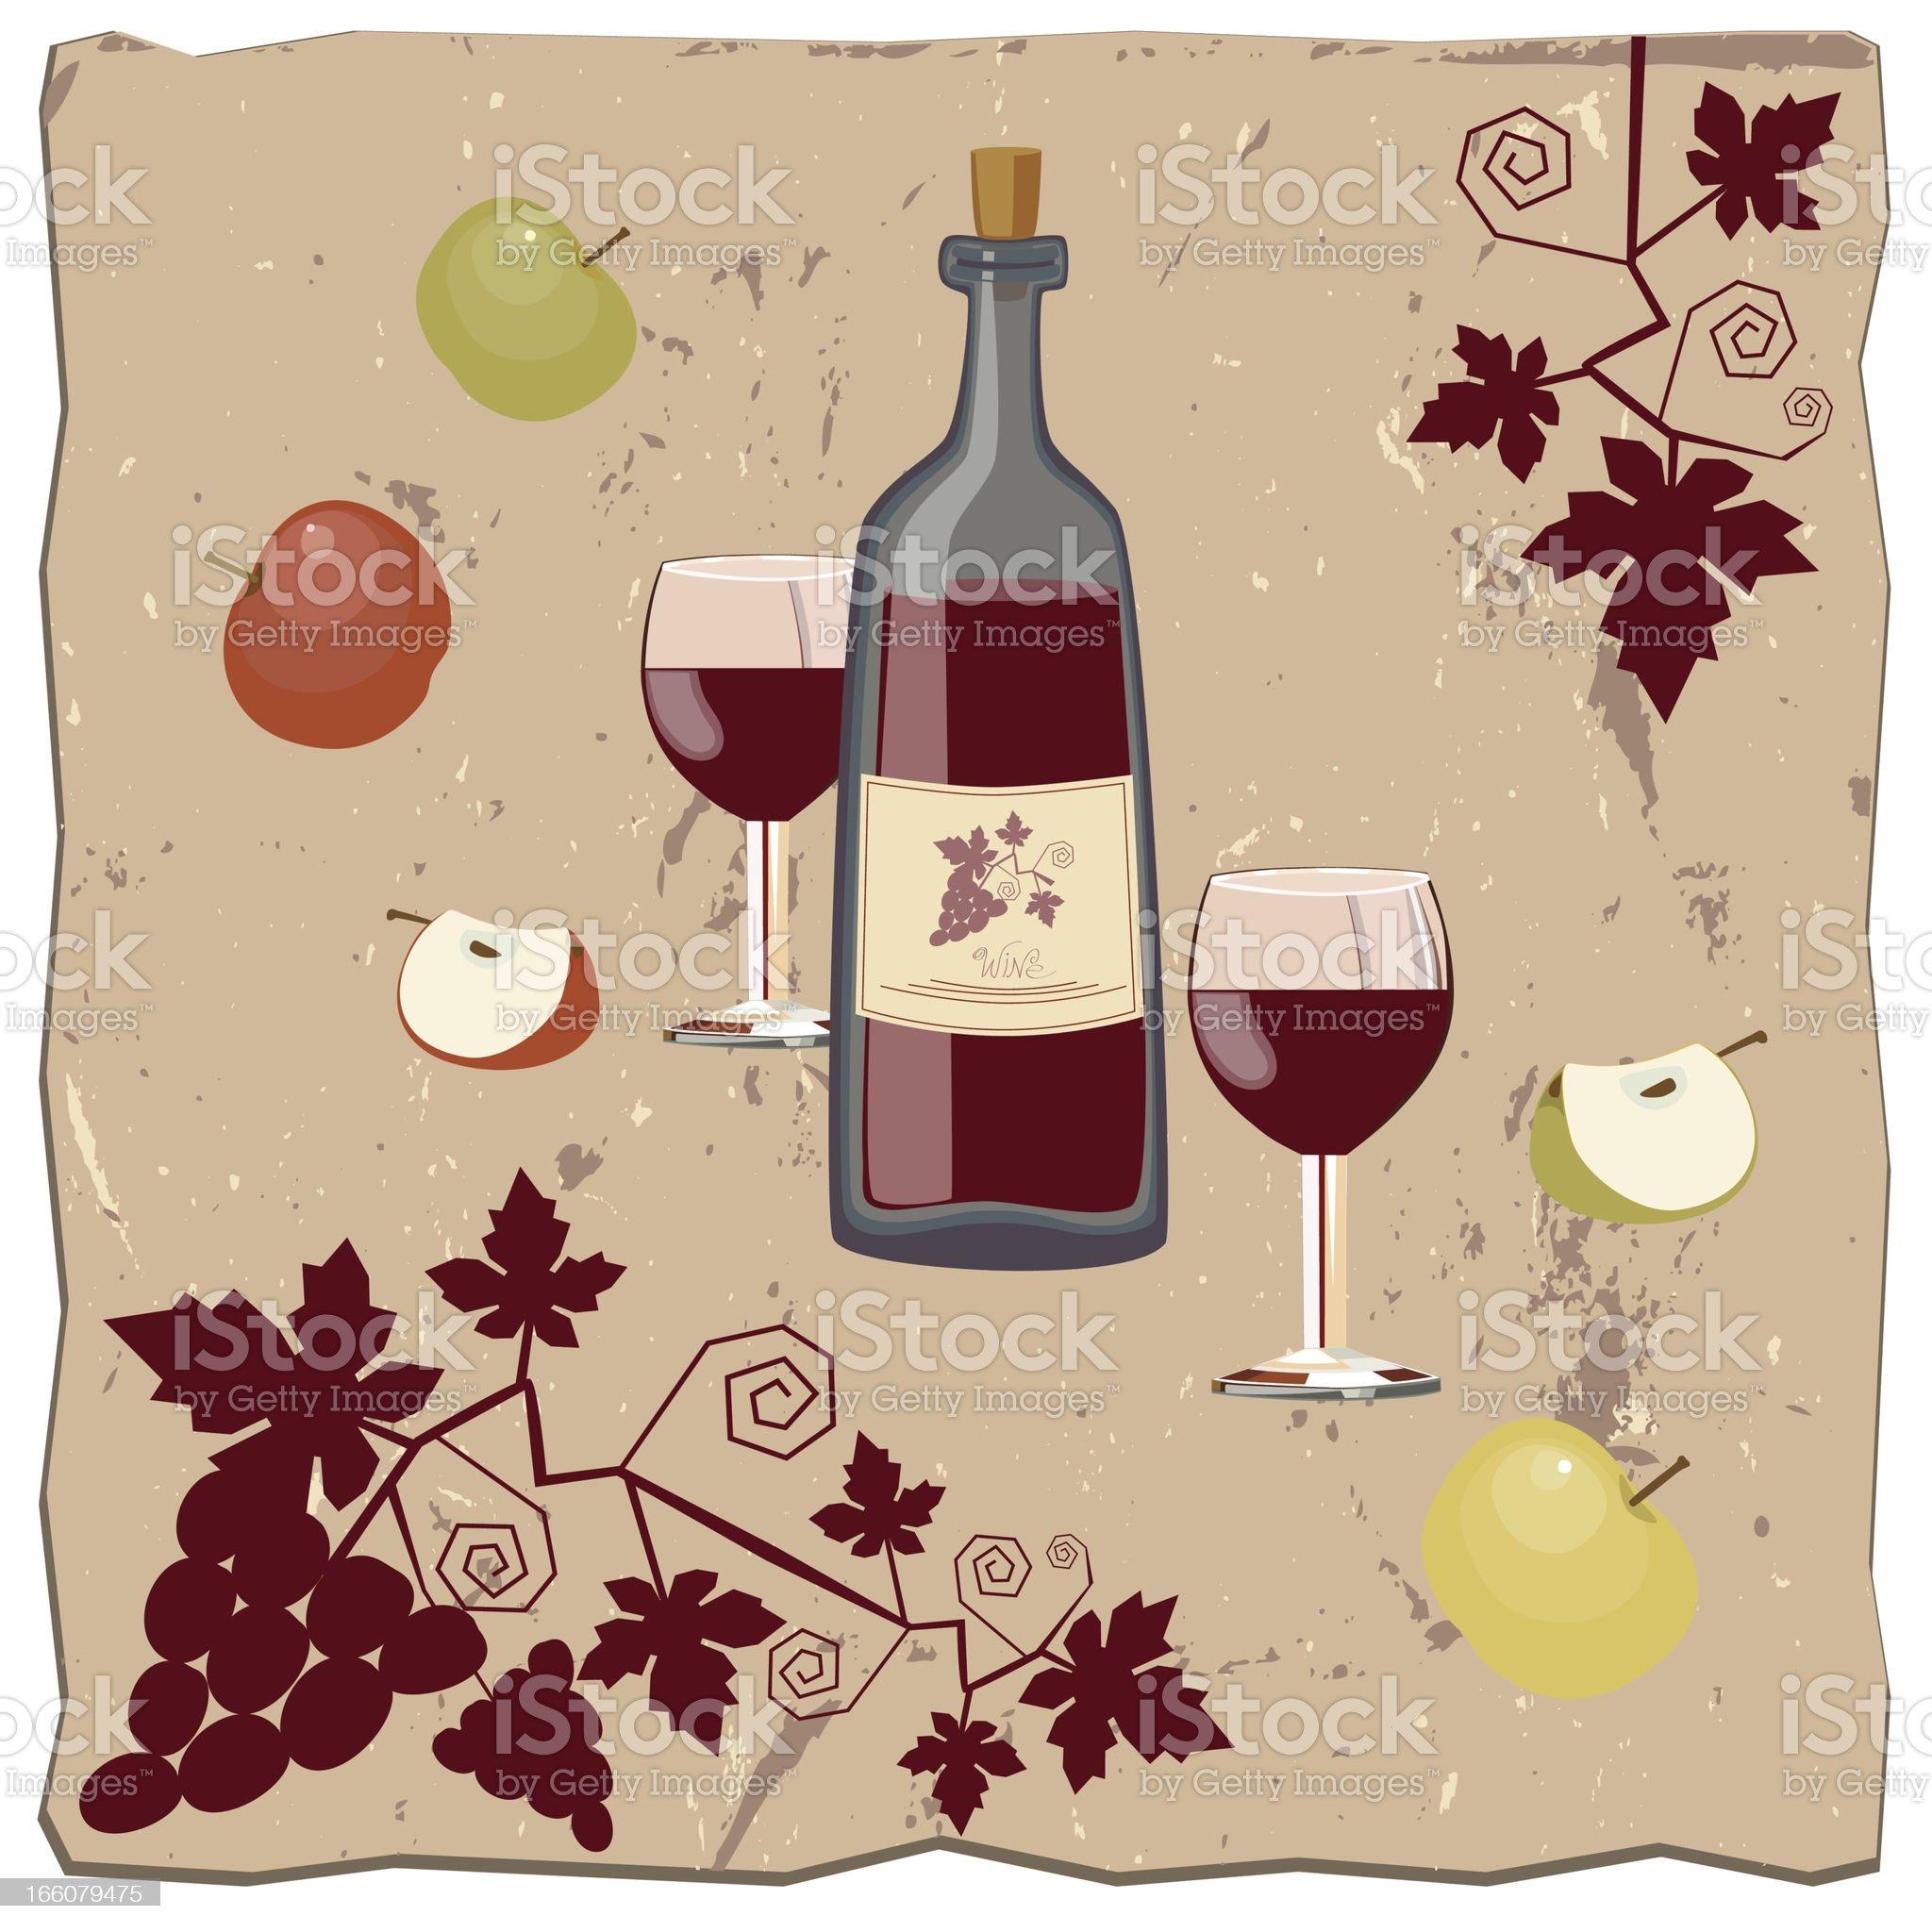 Apples, Bottle Of Wine and Vine royalty-free stock vector art